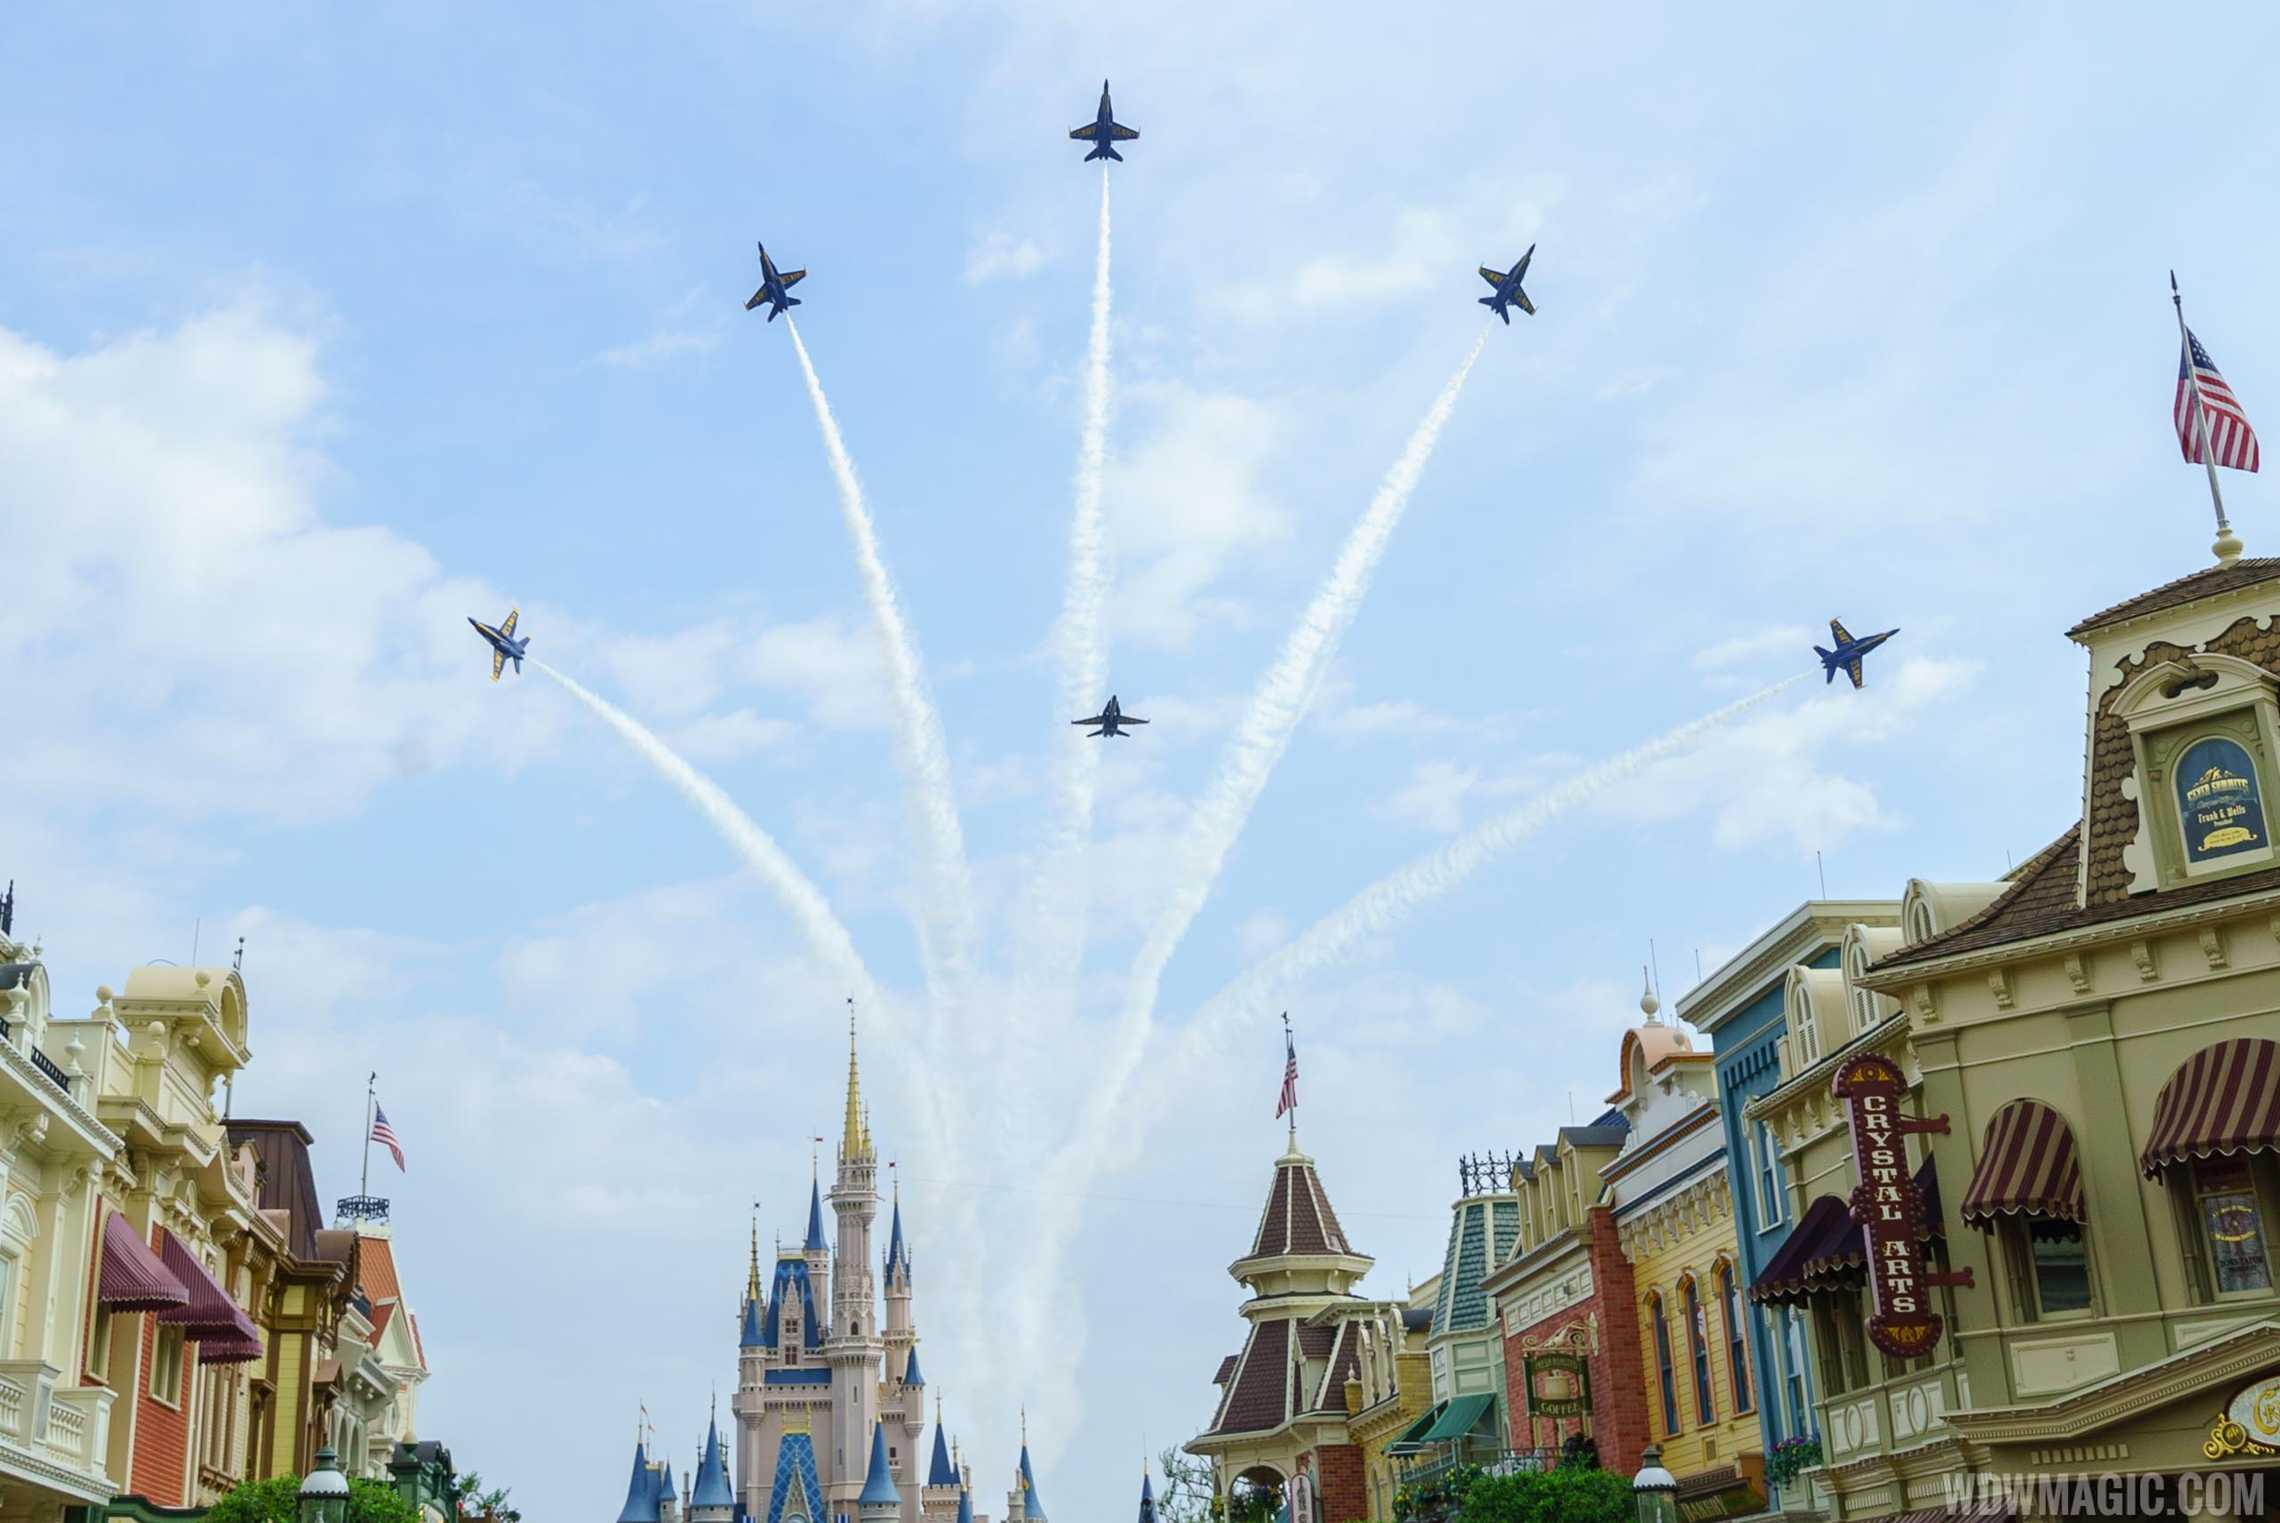 Blue Angels Delta Break over Cinderella Castle